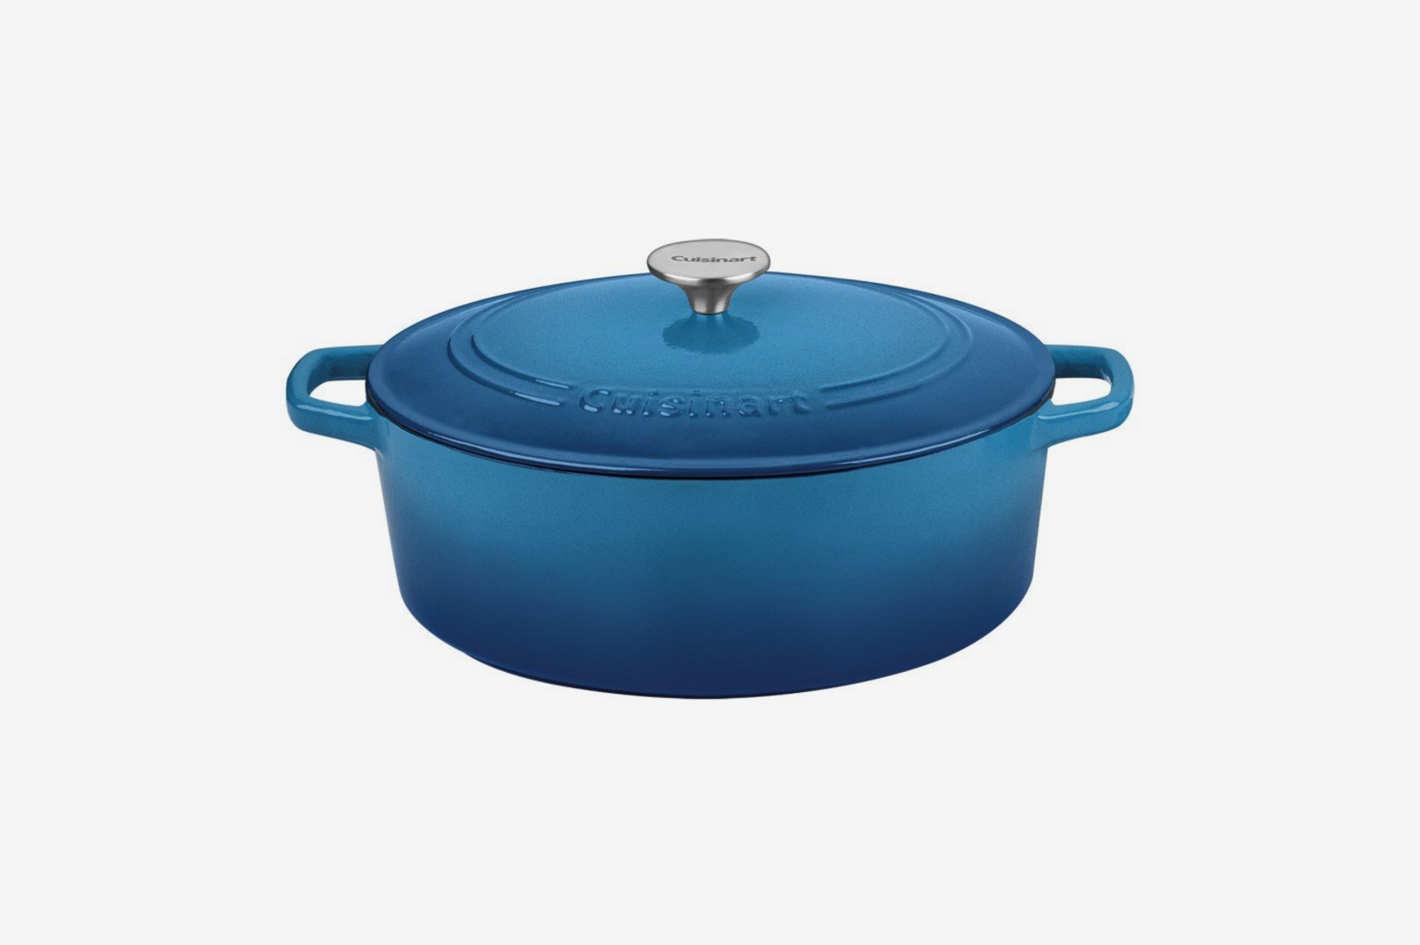 Cuisinart Casserole, Gradient Blue, 5.5-Qt.